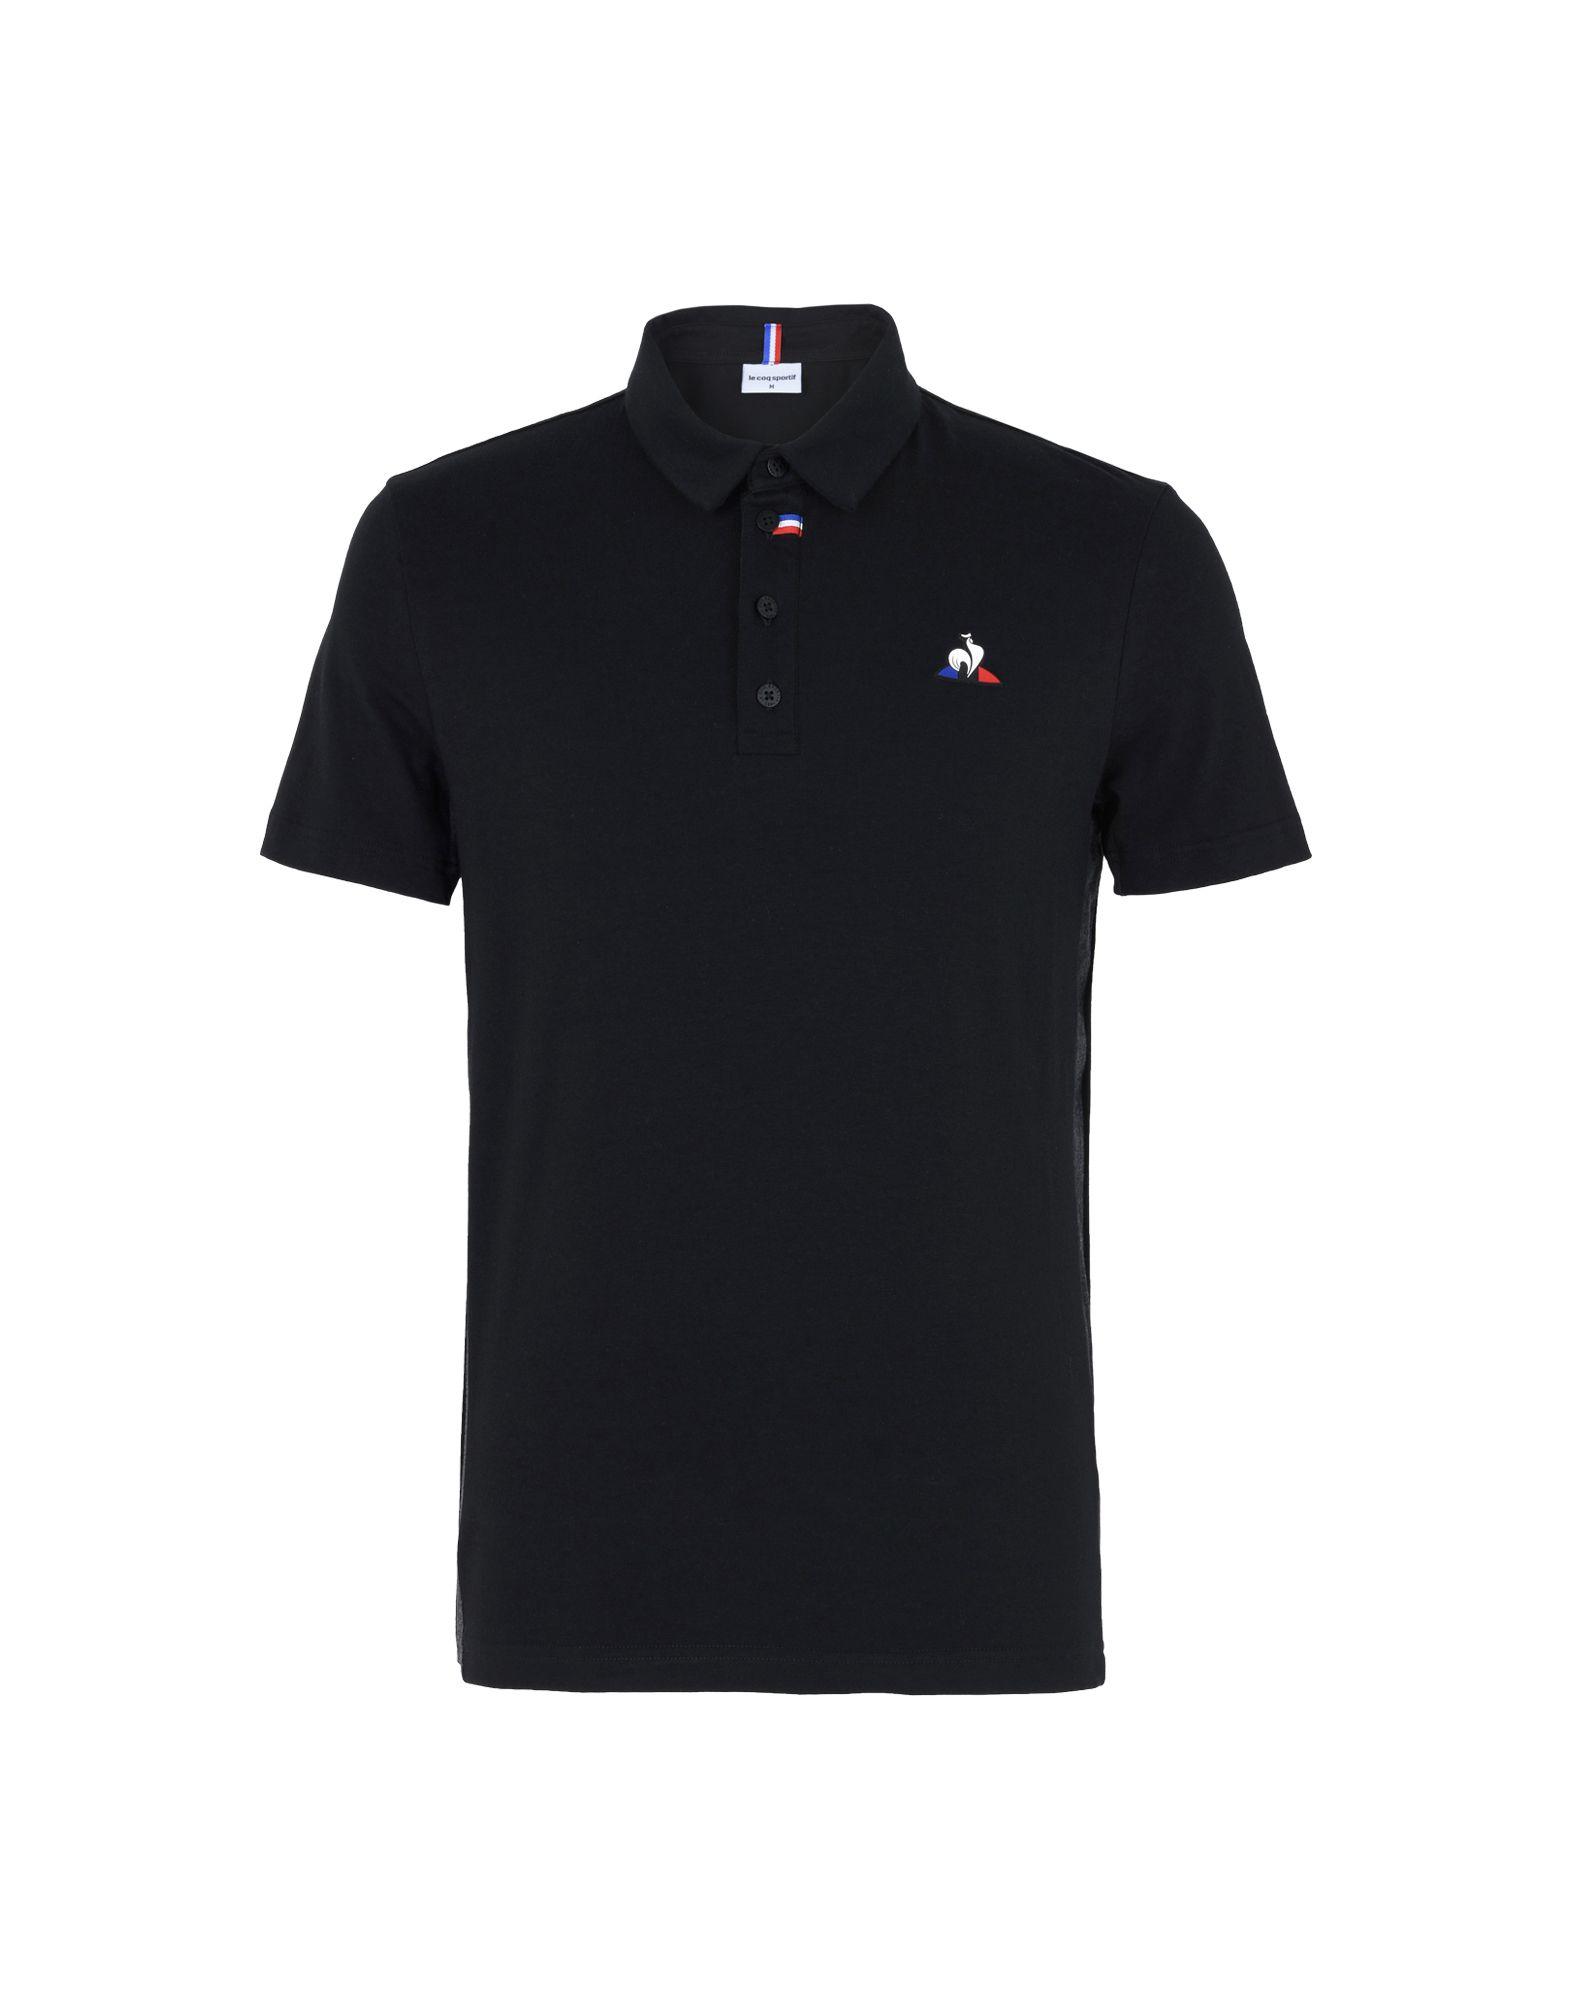 70f0f6cc08 Le Coq Sportif Polo Shirts for Men - Le Coq Sportif T-Shirts And Tops | YOOX